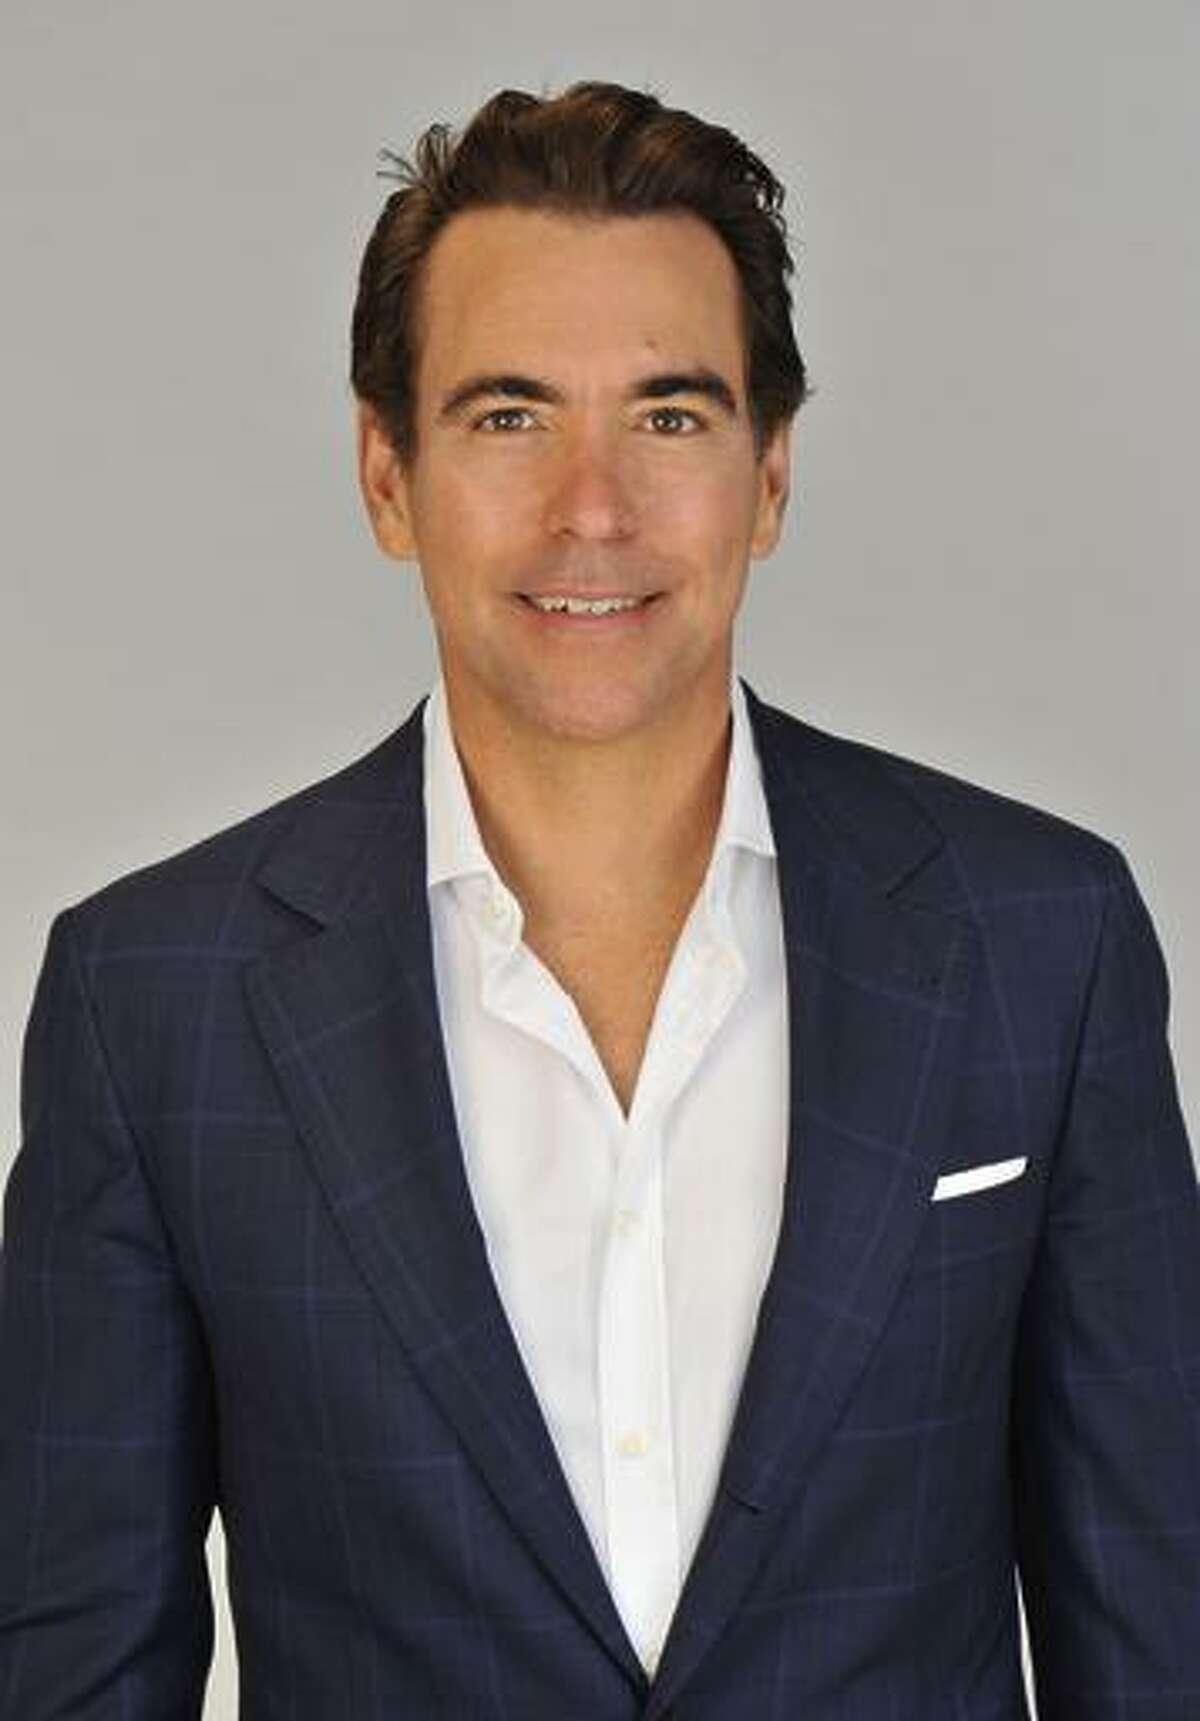 Orlando Bravo, San Francisco private equity investor